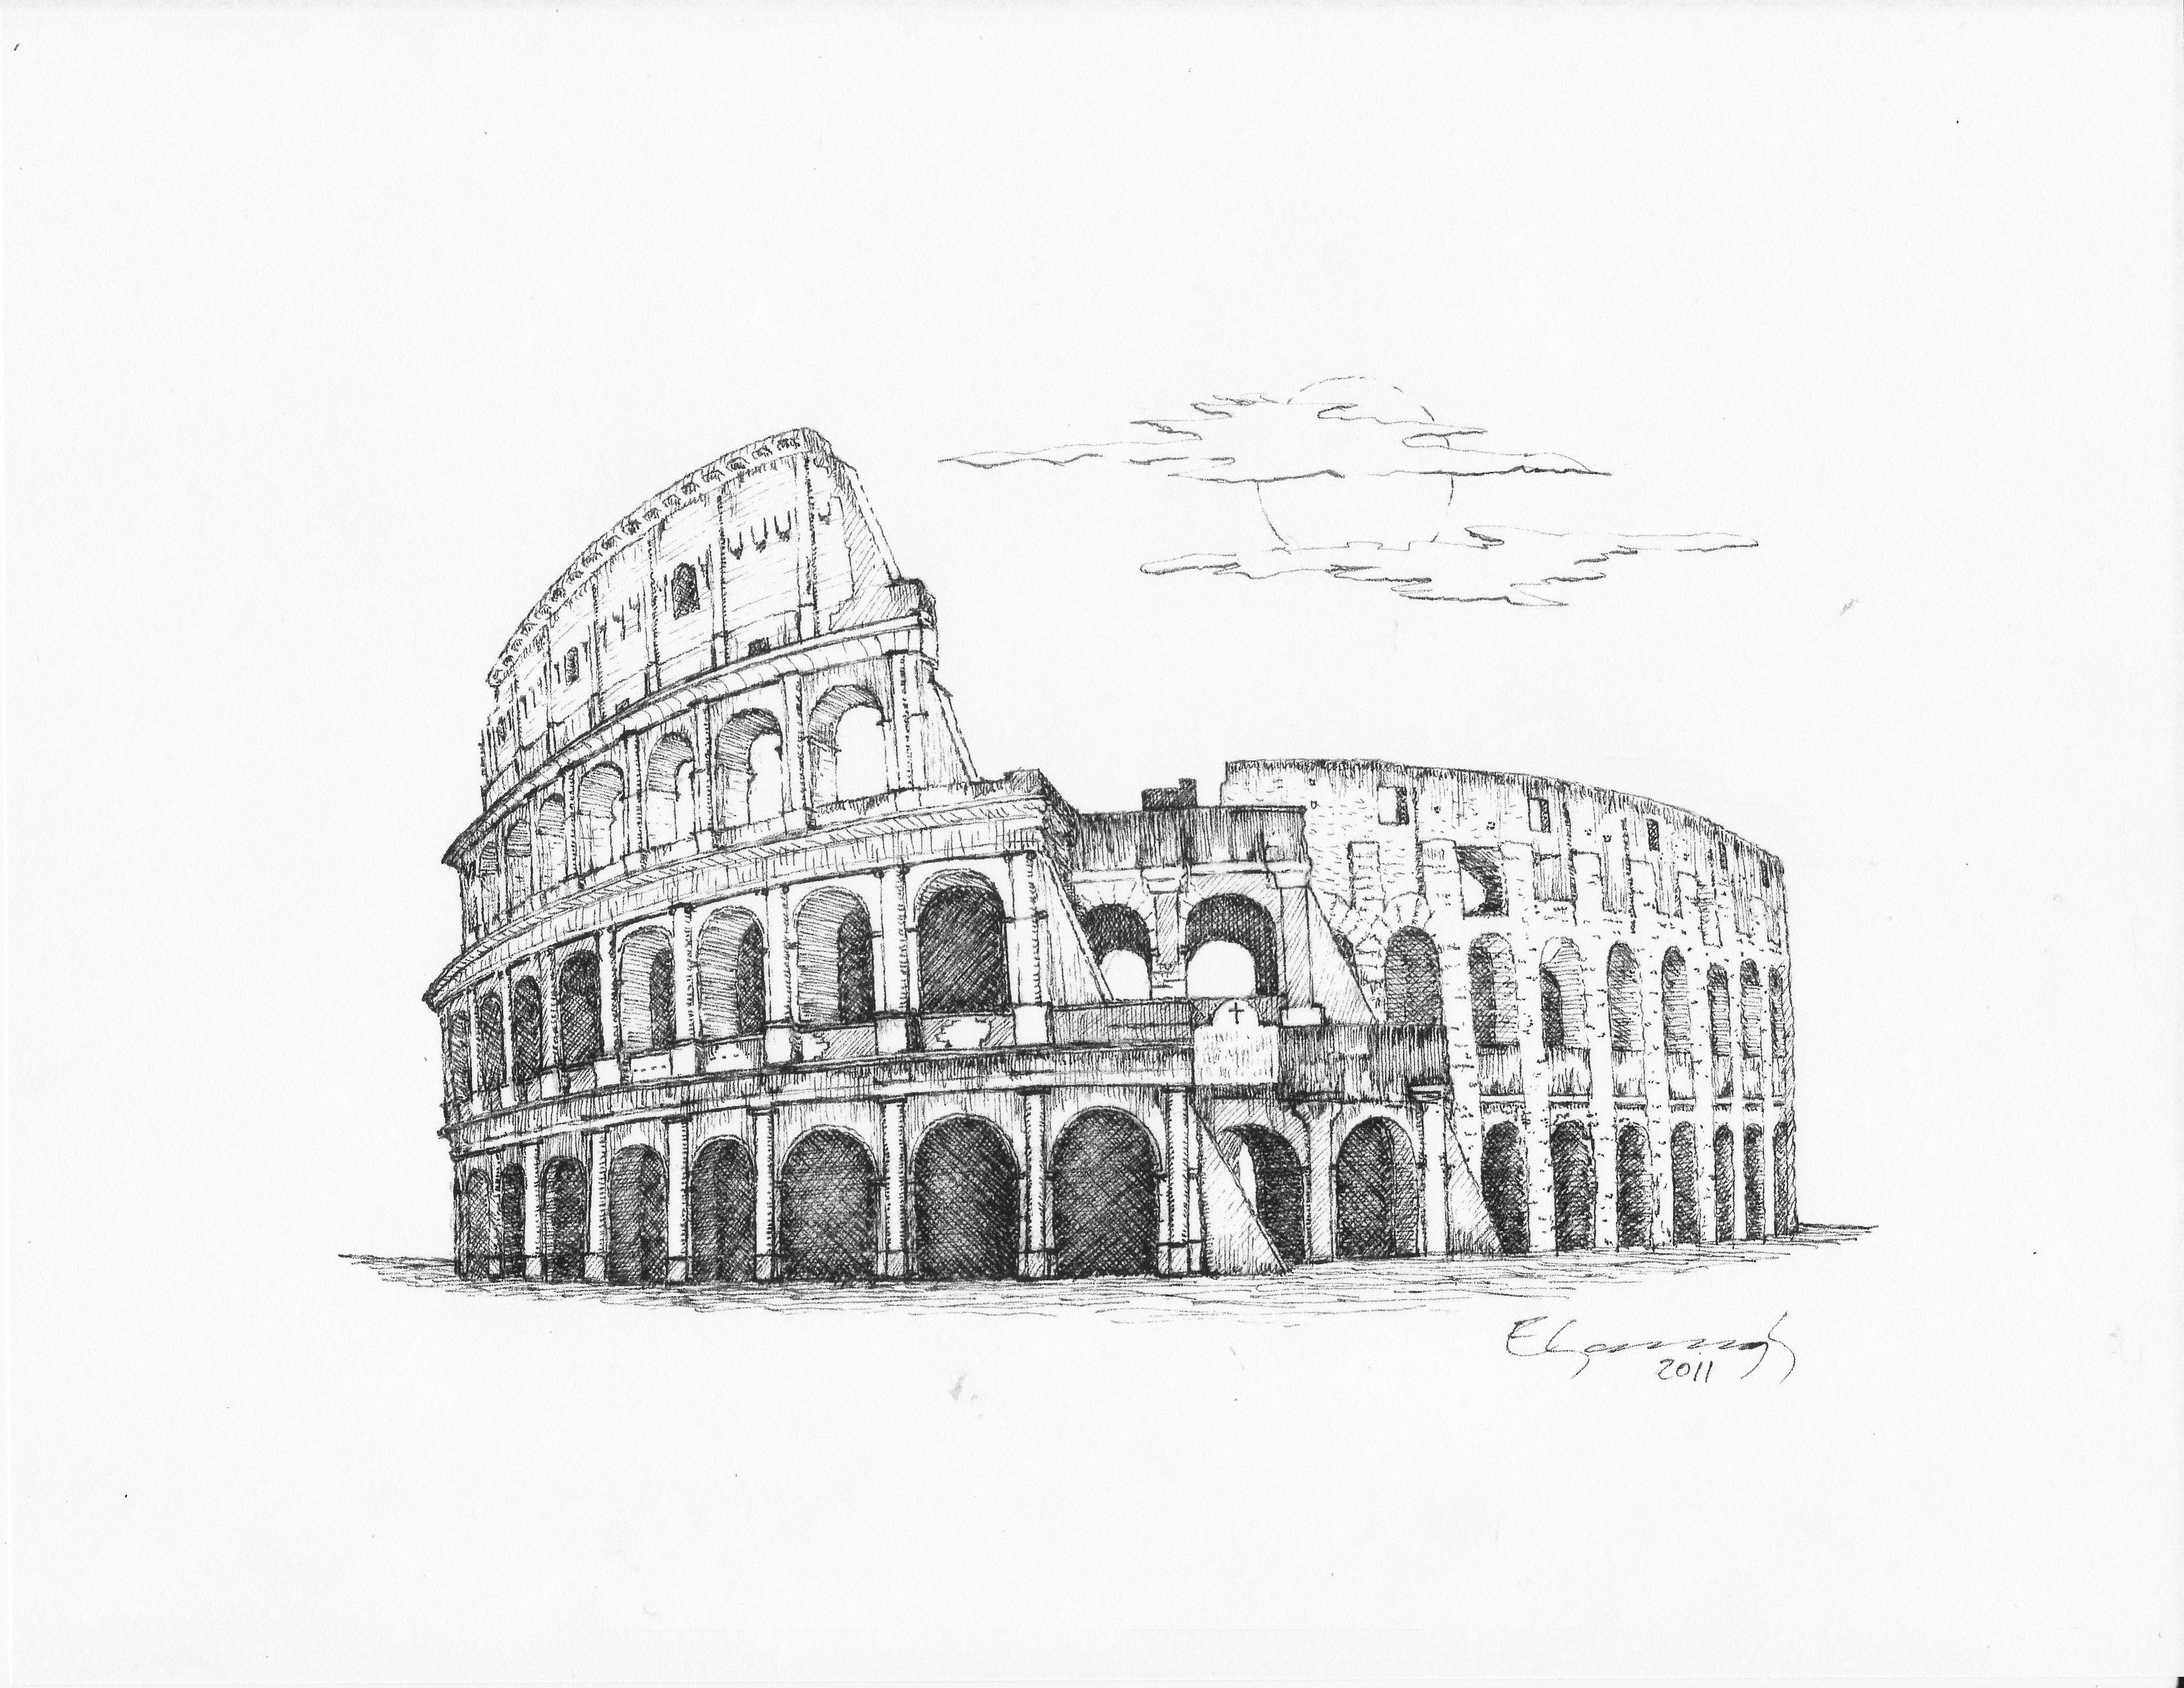 Coliseo En Roma Dibujos Dibujos A Lápiz Bocetos Tatuajes Y